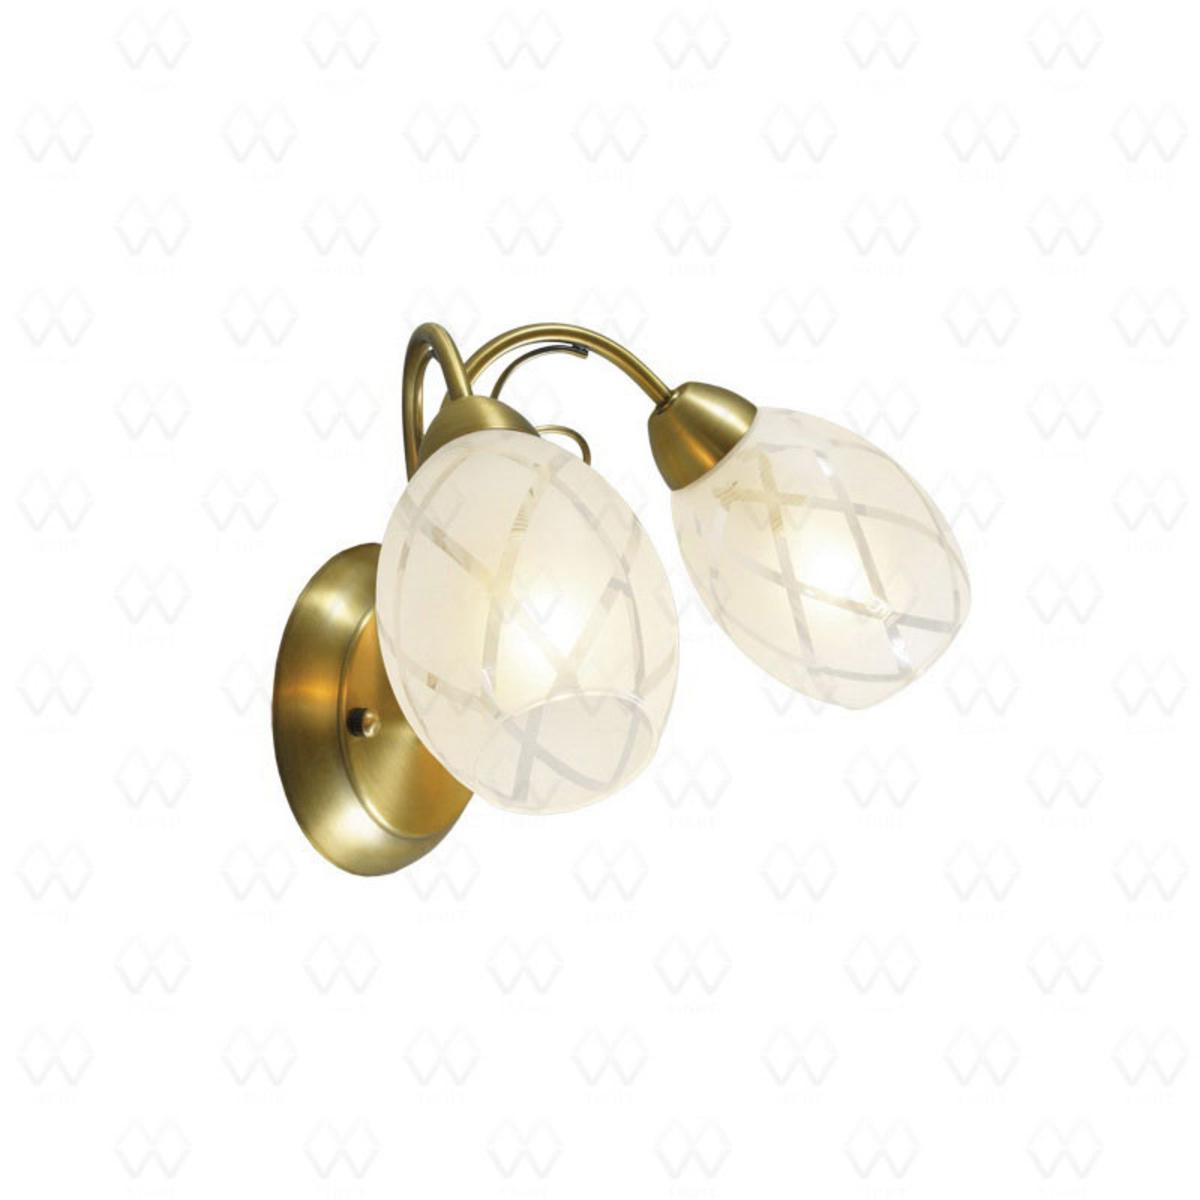 Купить Бра Грация Бра MW-Light 358021402 (14472), HomeMe